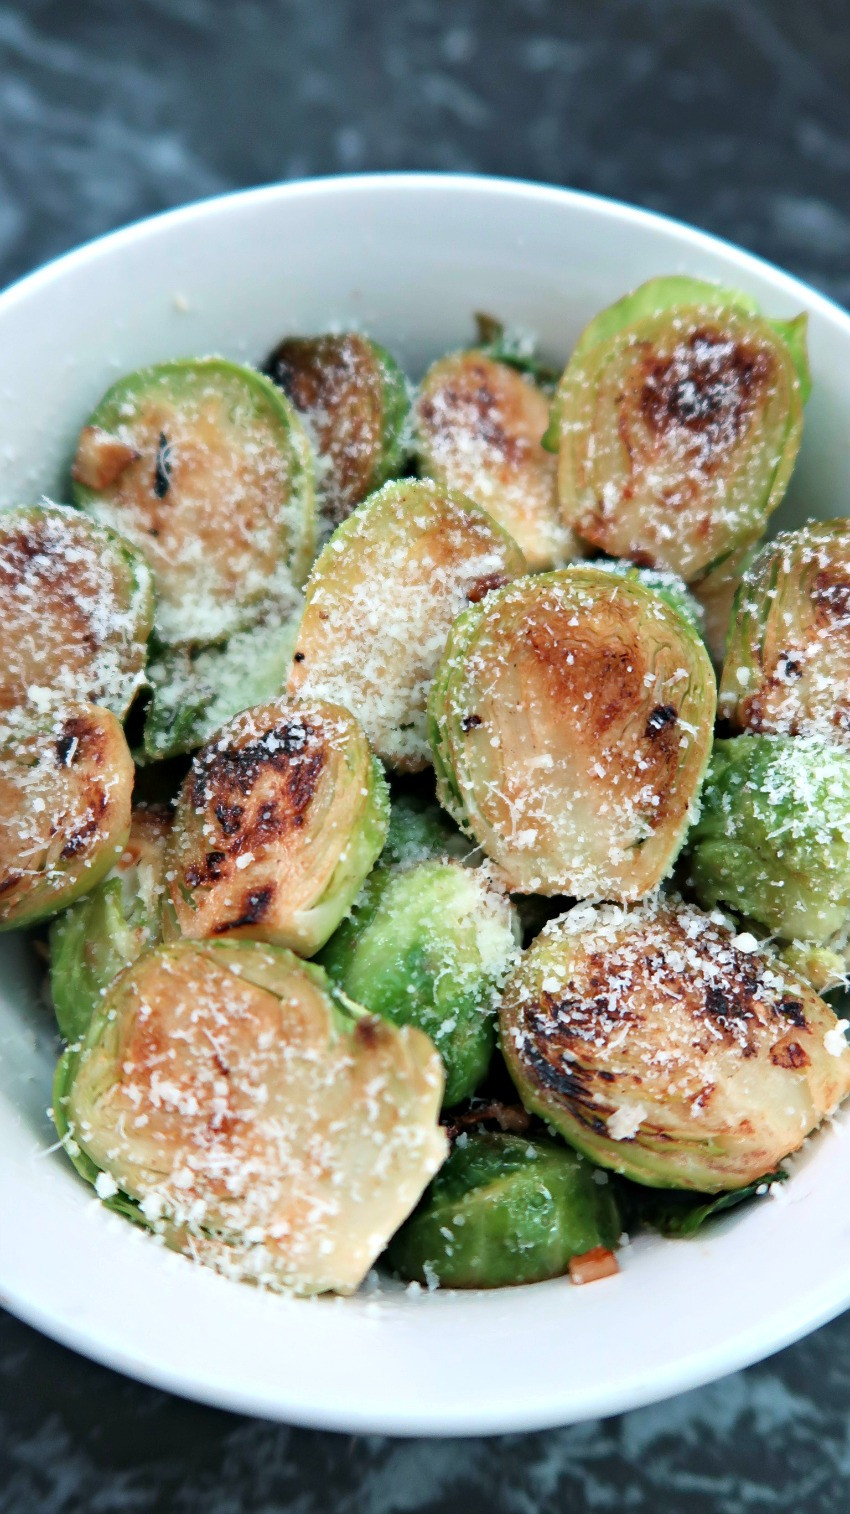 Keto Dinner Recipes  30 Keto Diet Recipes Easy Low Carb & Ketogenic Diet Ideas